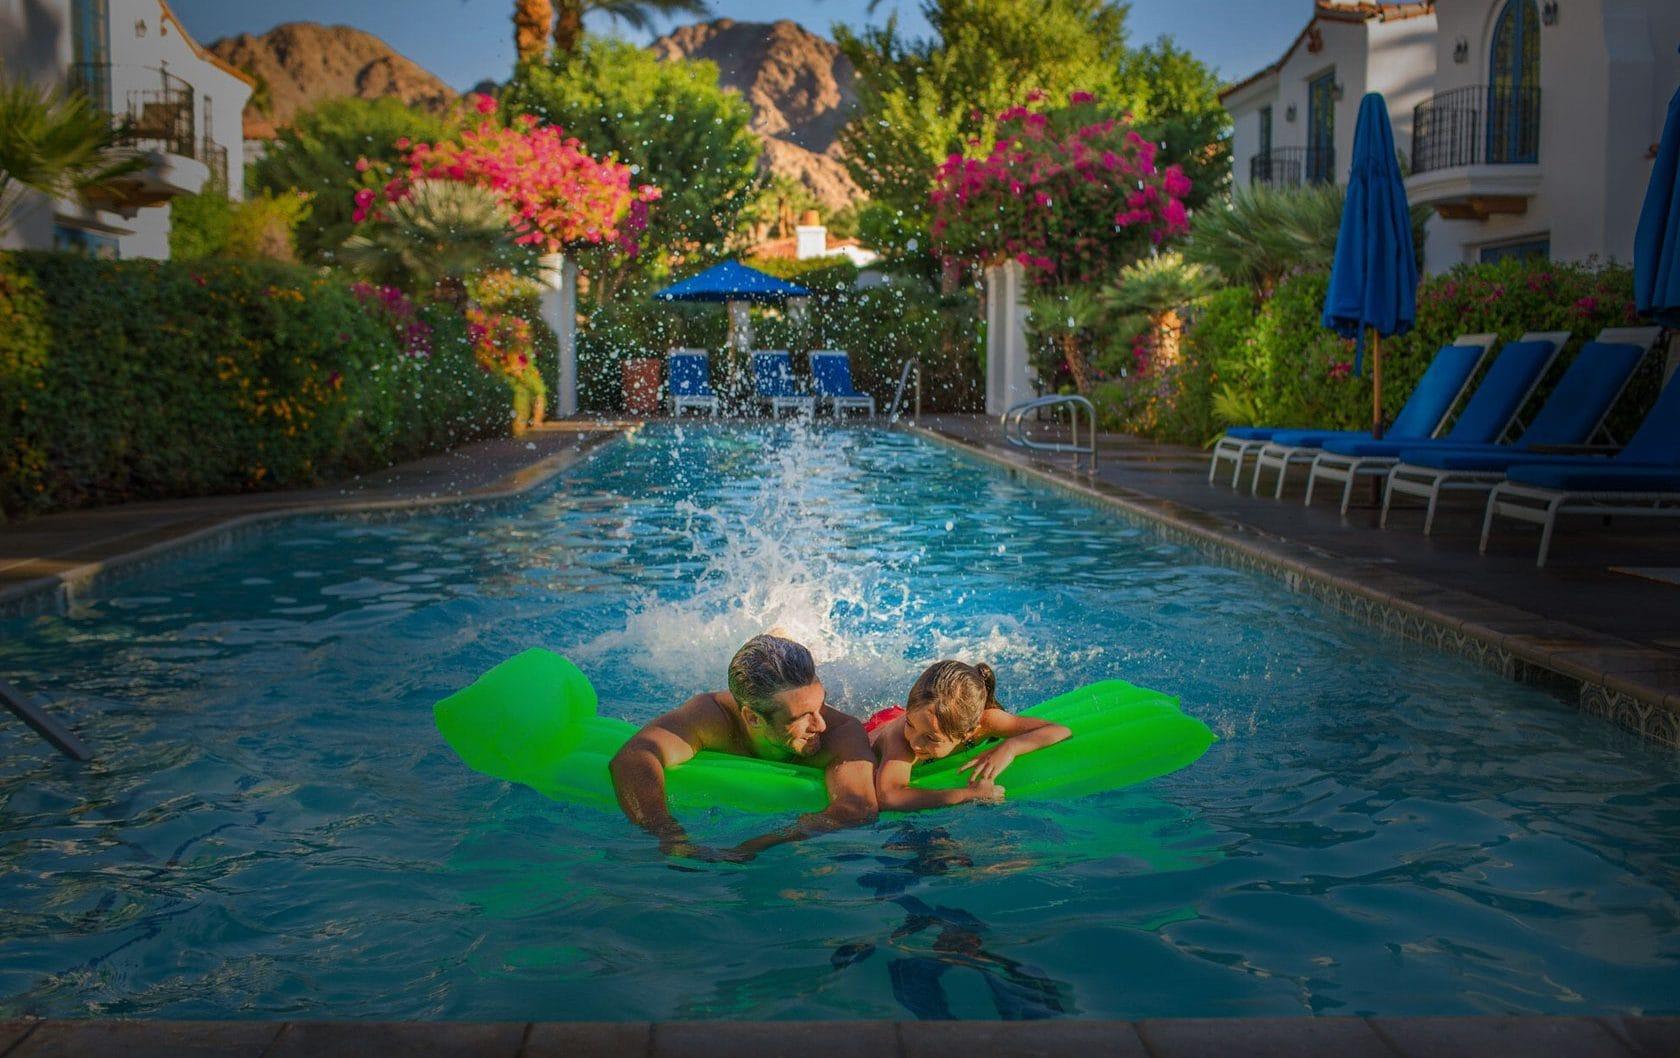 Pools la quinta resort club - Club mahindra kandaghat swimming pool ...